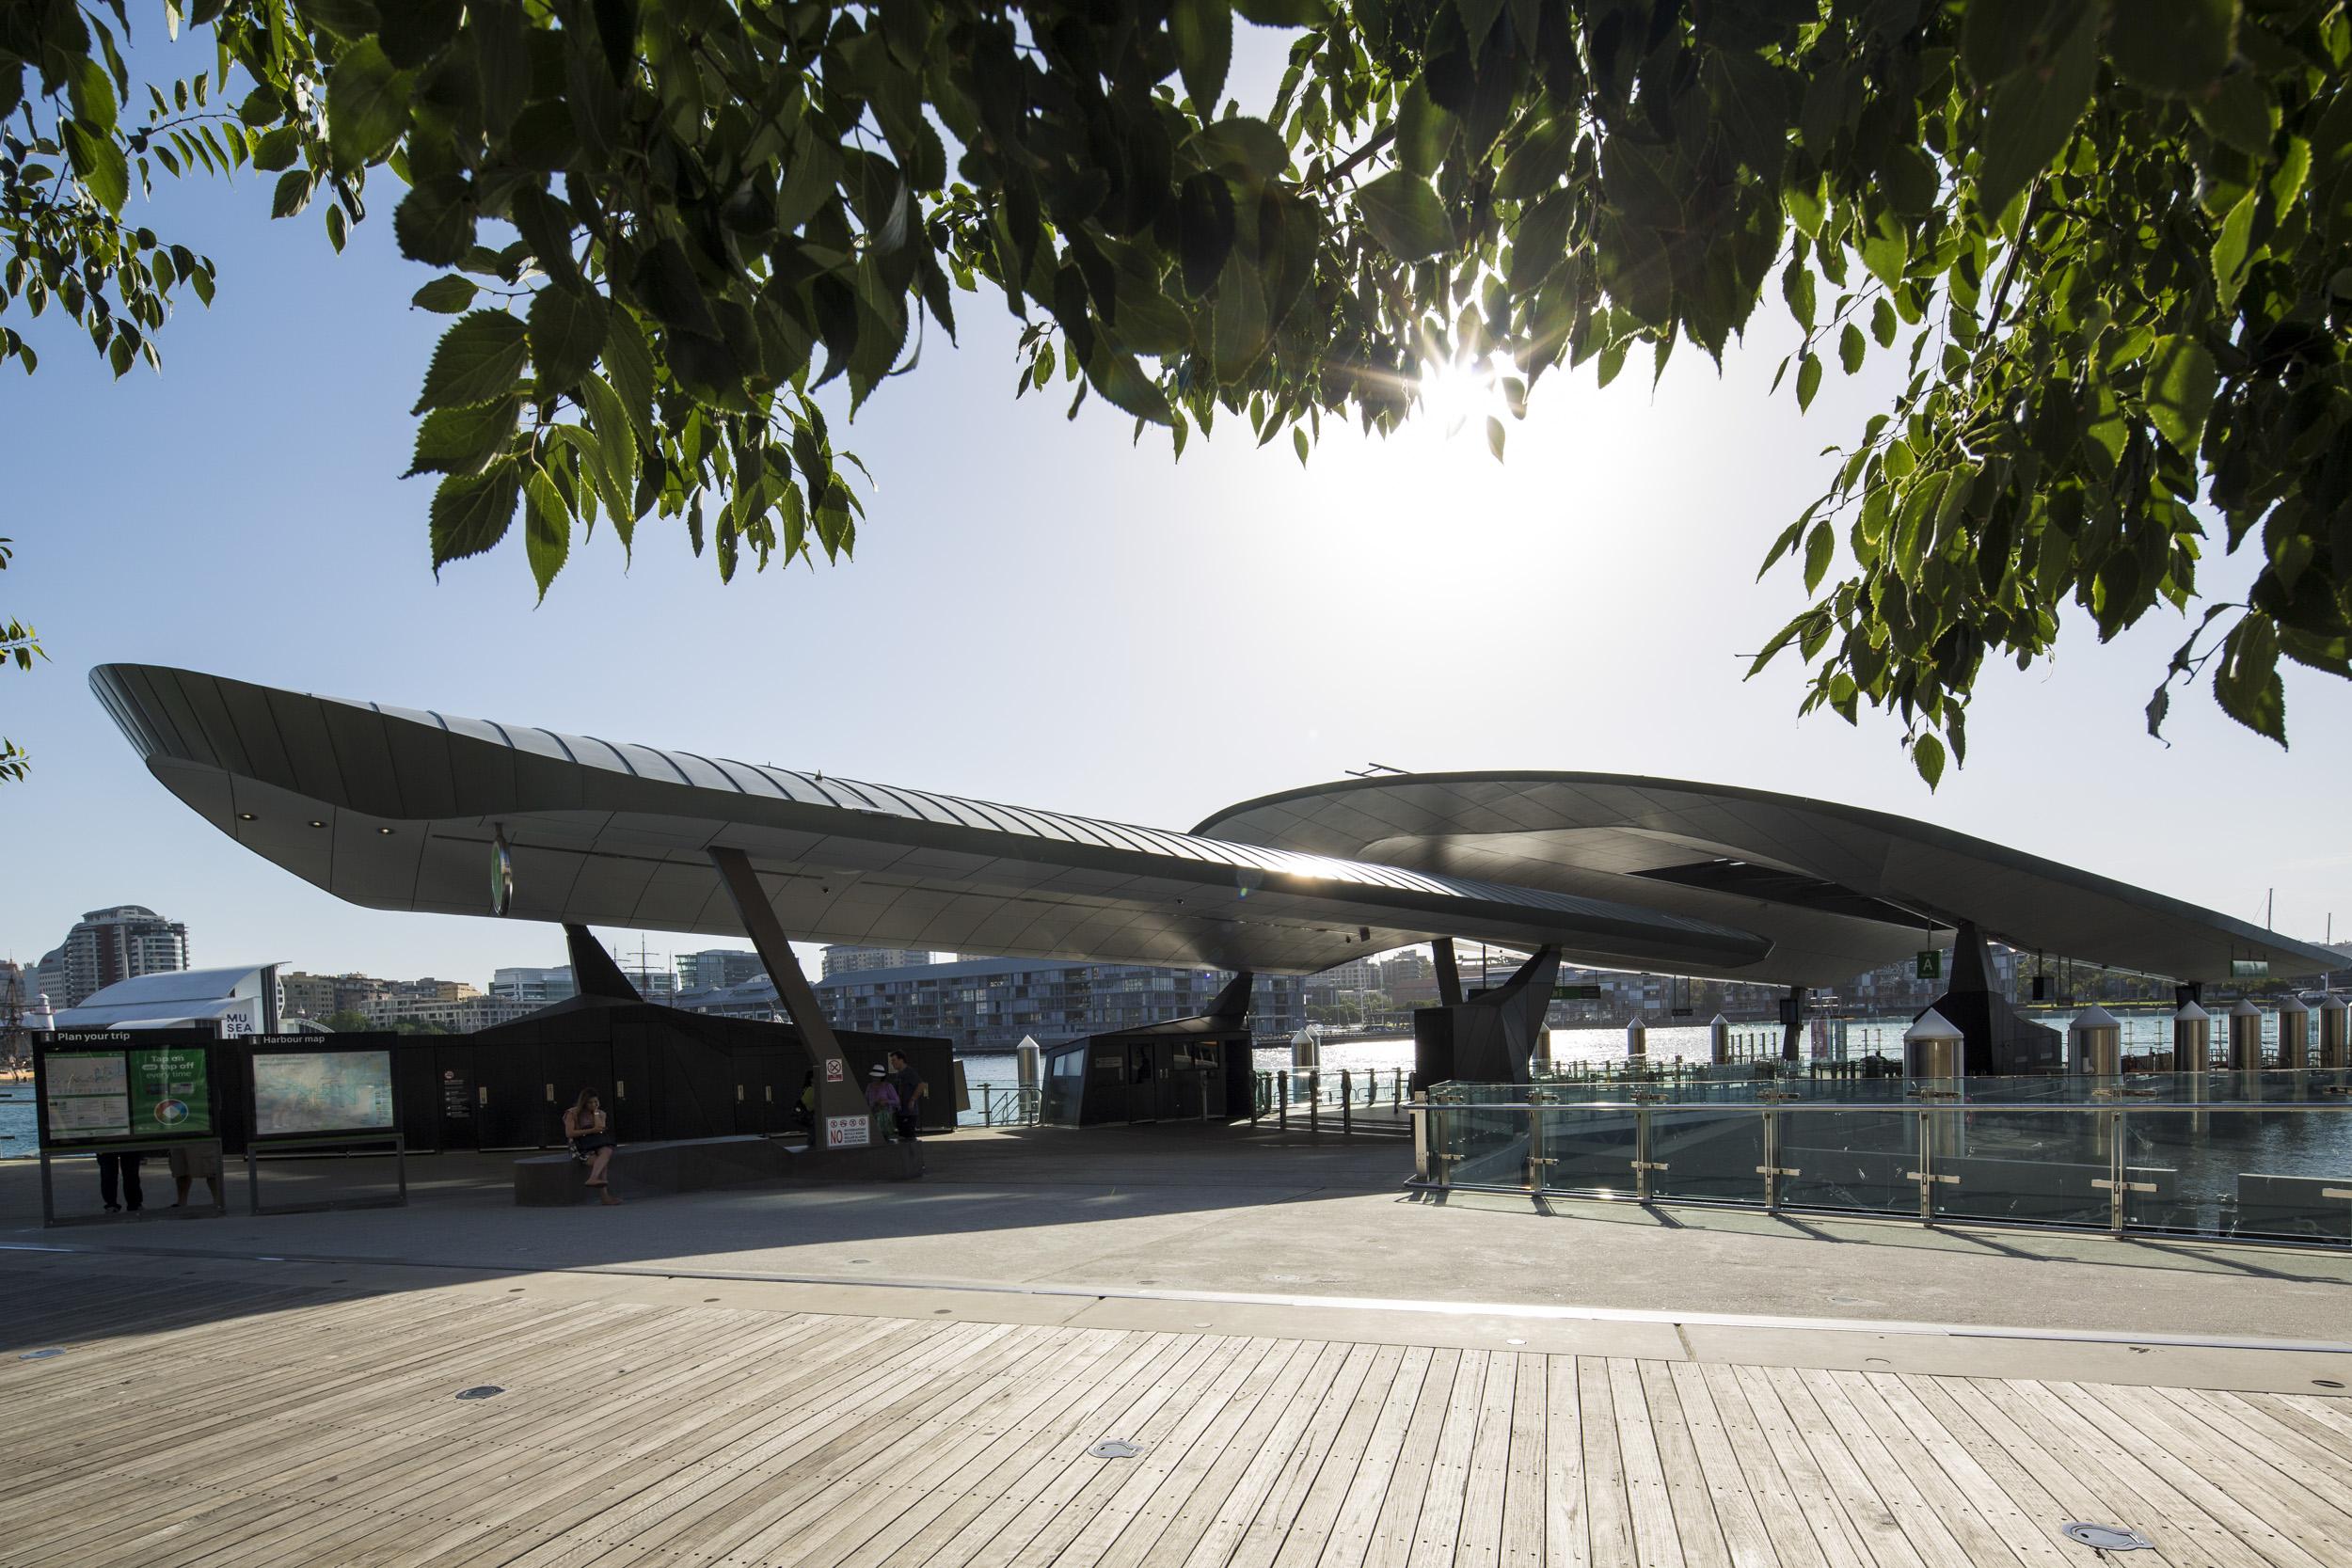 Barangaroo_wharf_cox_architecture_sydney_05.jpg